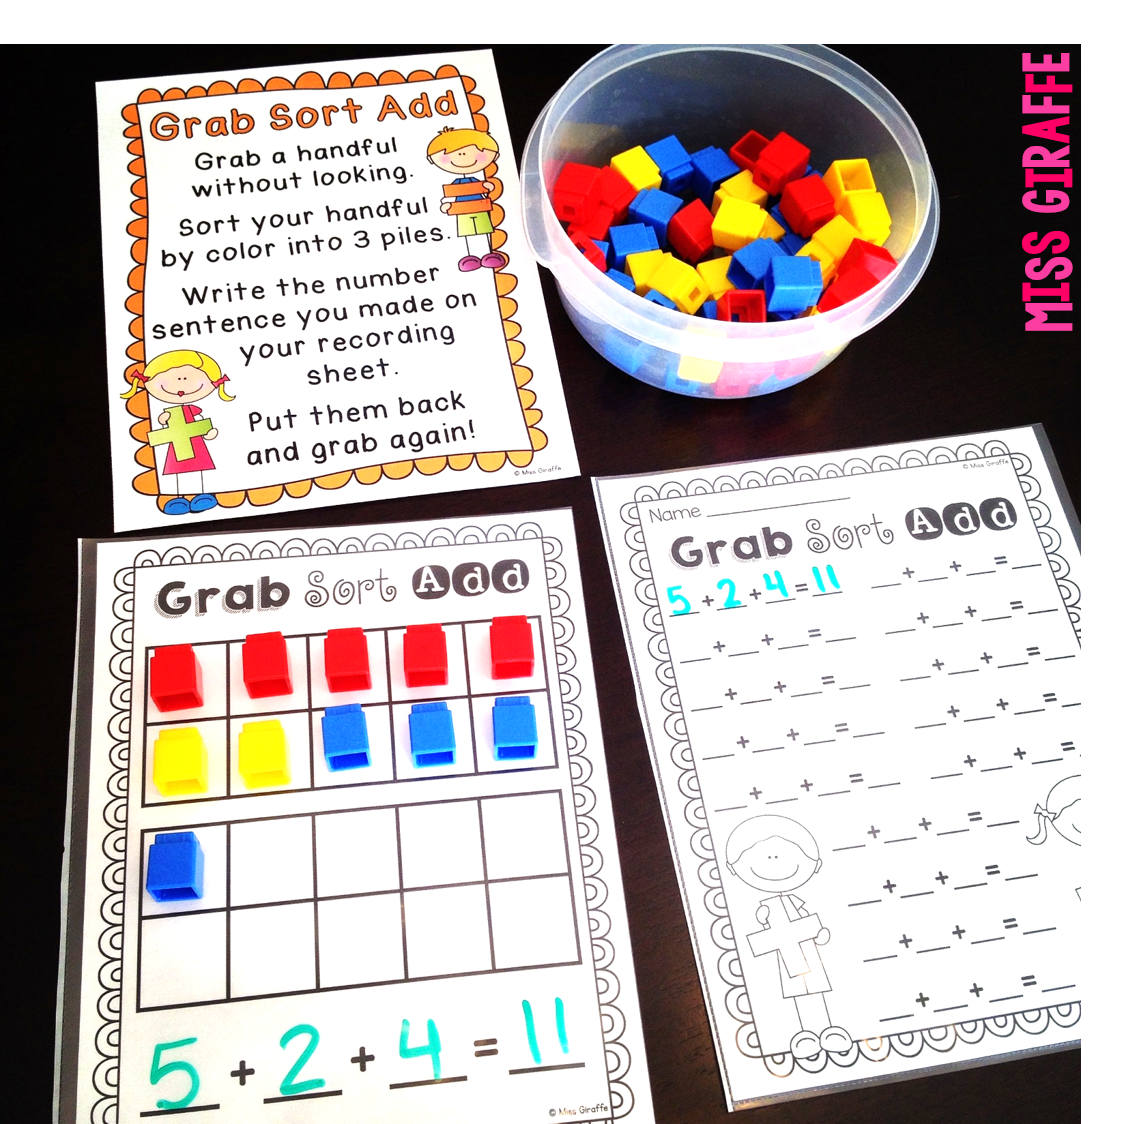 hight resolution of Miss Giraffe's Class: Adding 3 Numbers